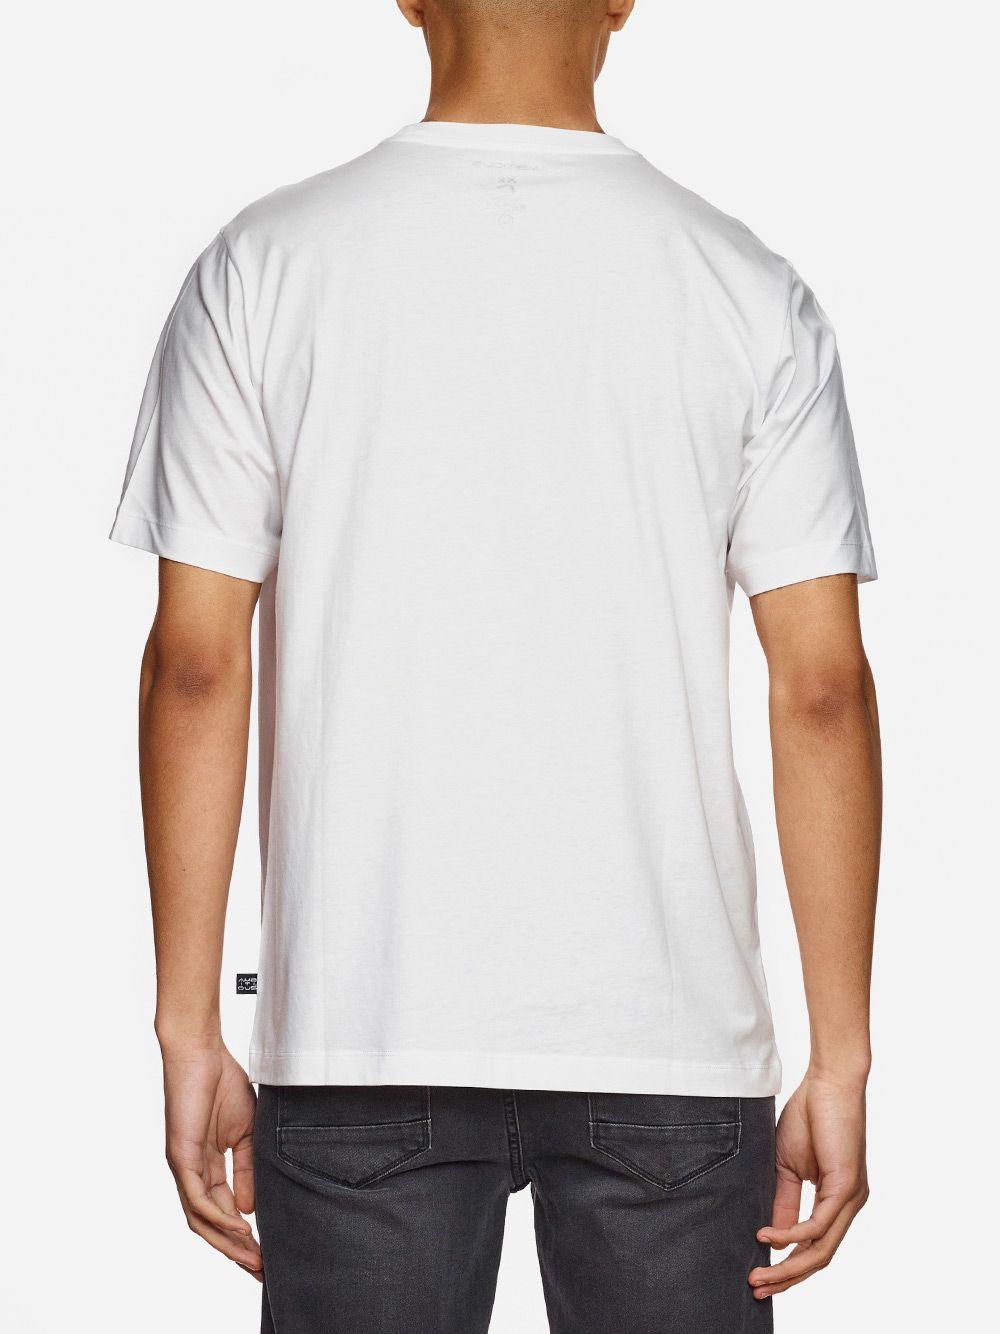 T-Shirt Branca Estampada | AMBITIOUS